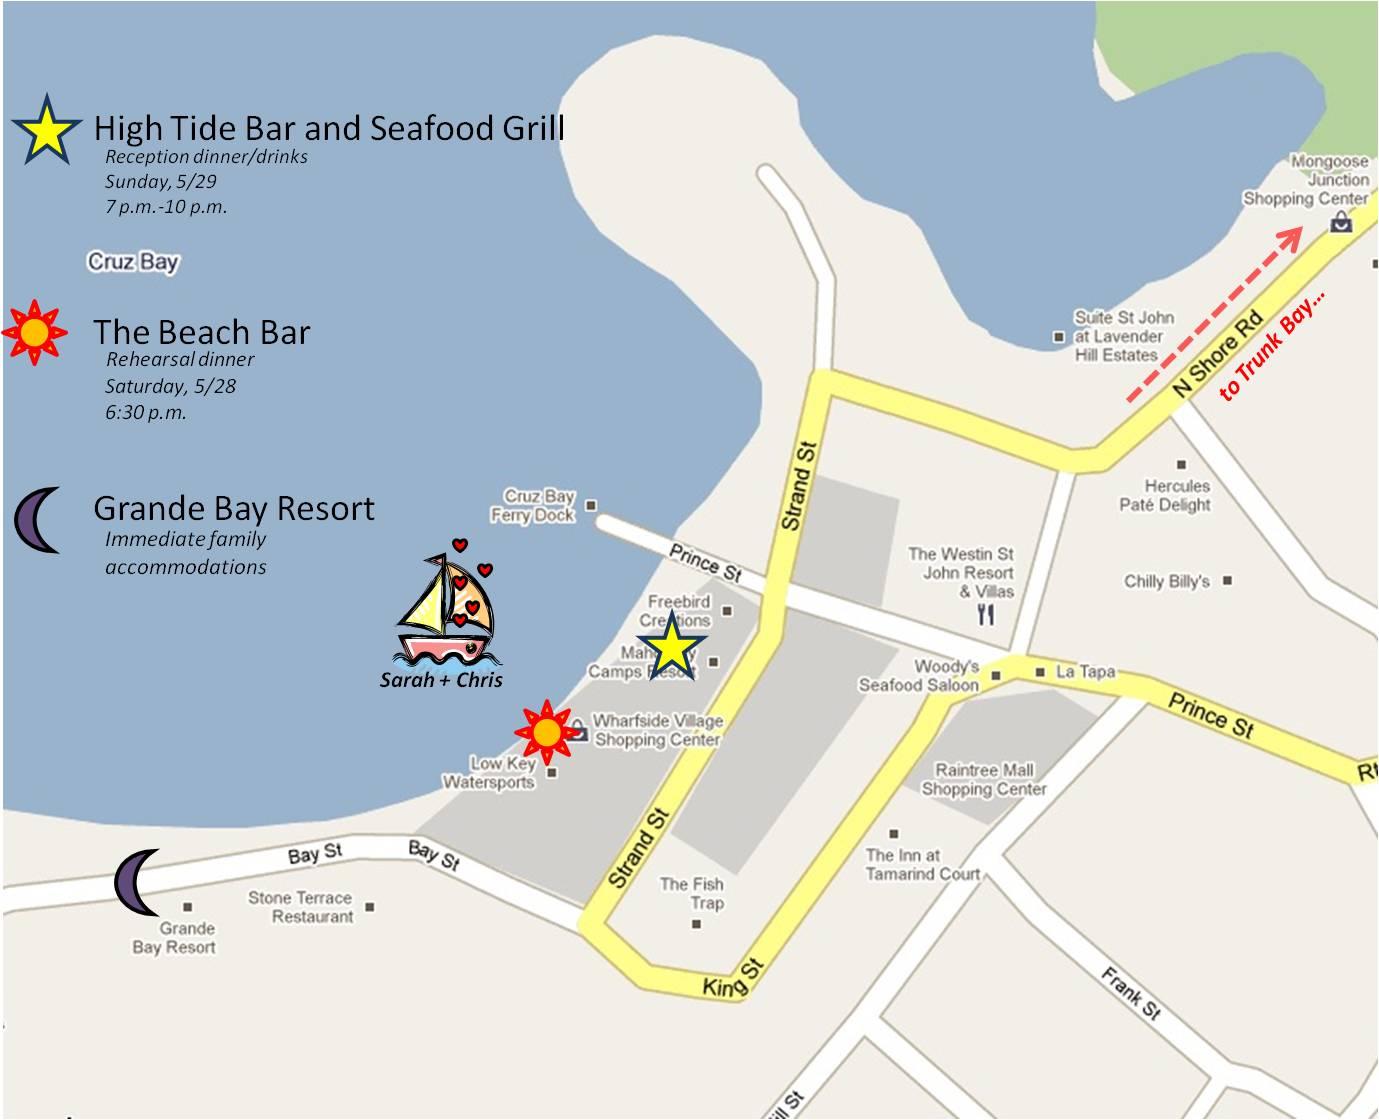 Cruz Bay Shopping Restaurant Entertainment